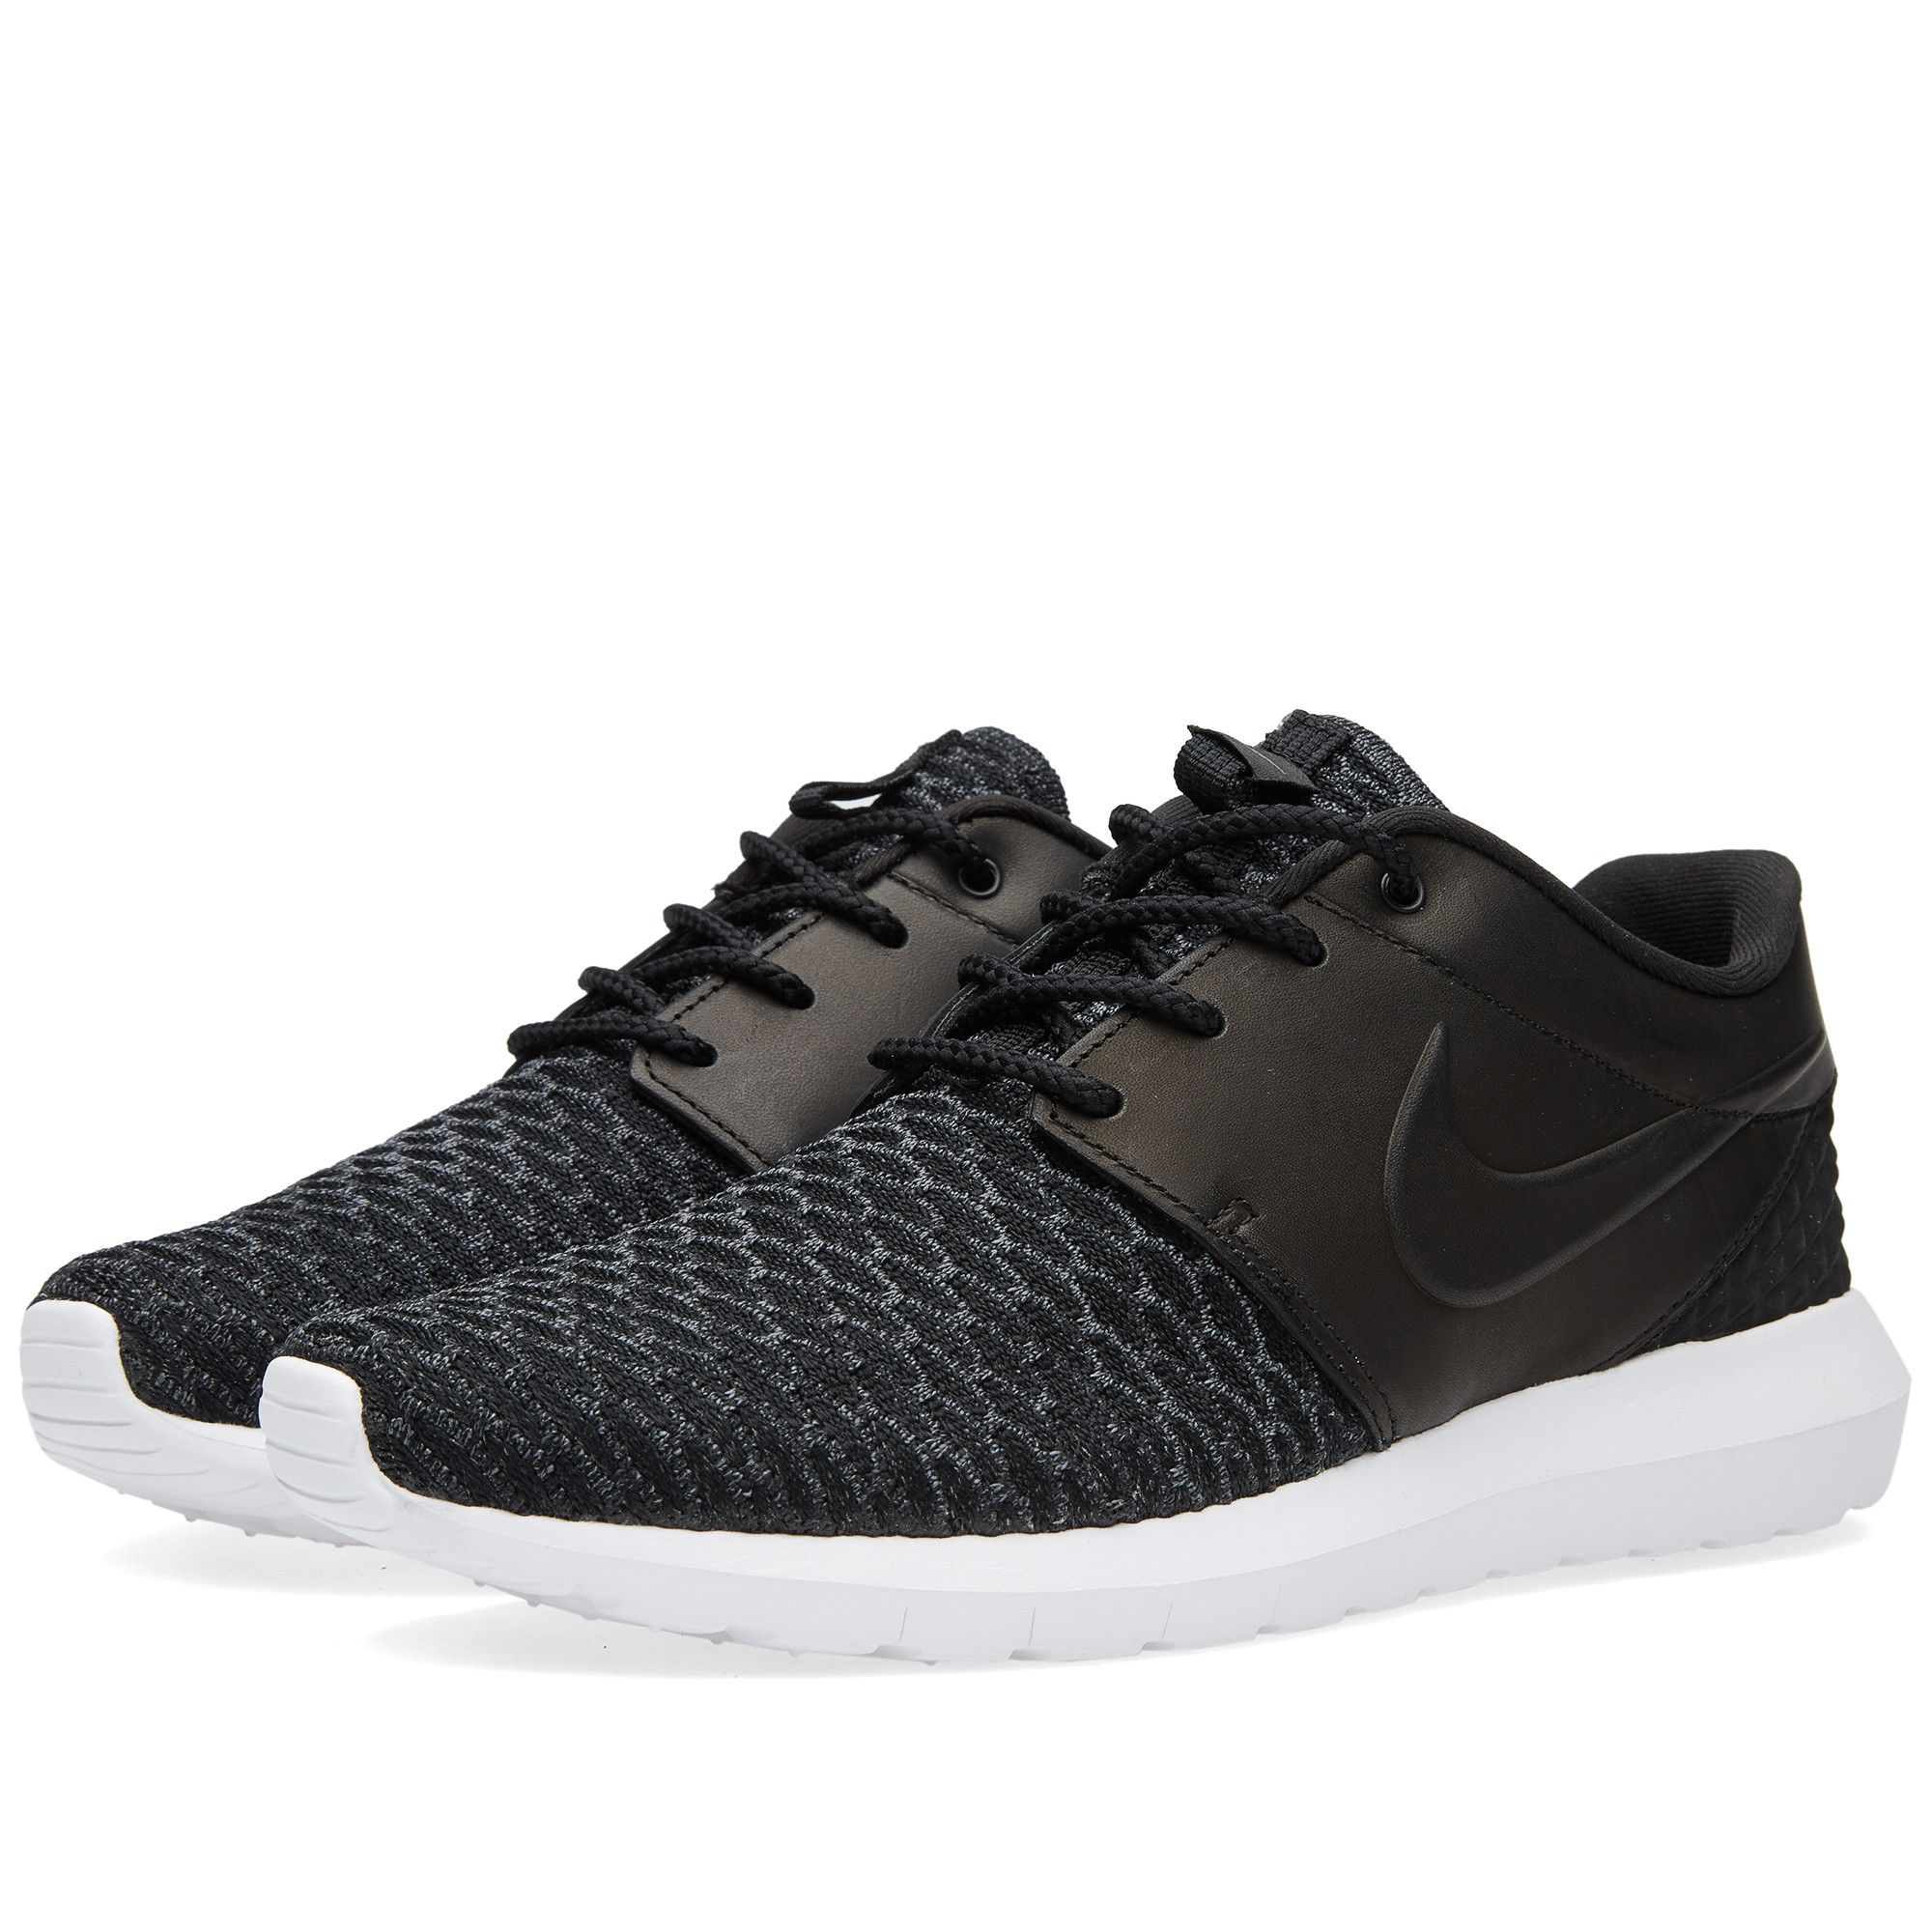 cbf95c80bb08 Nike Roshe One NM Flyknit Premium (Black